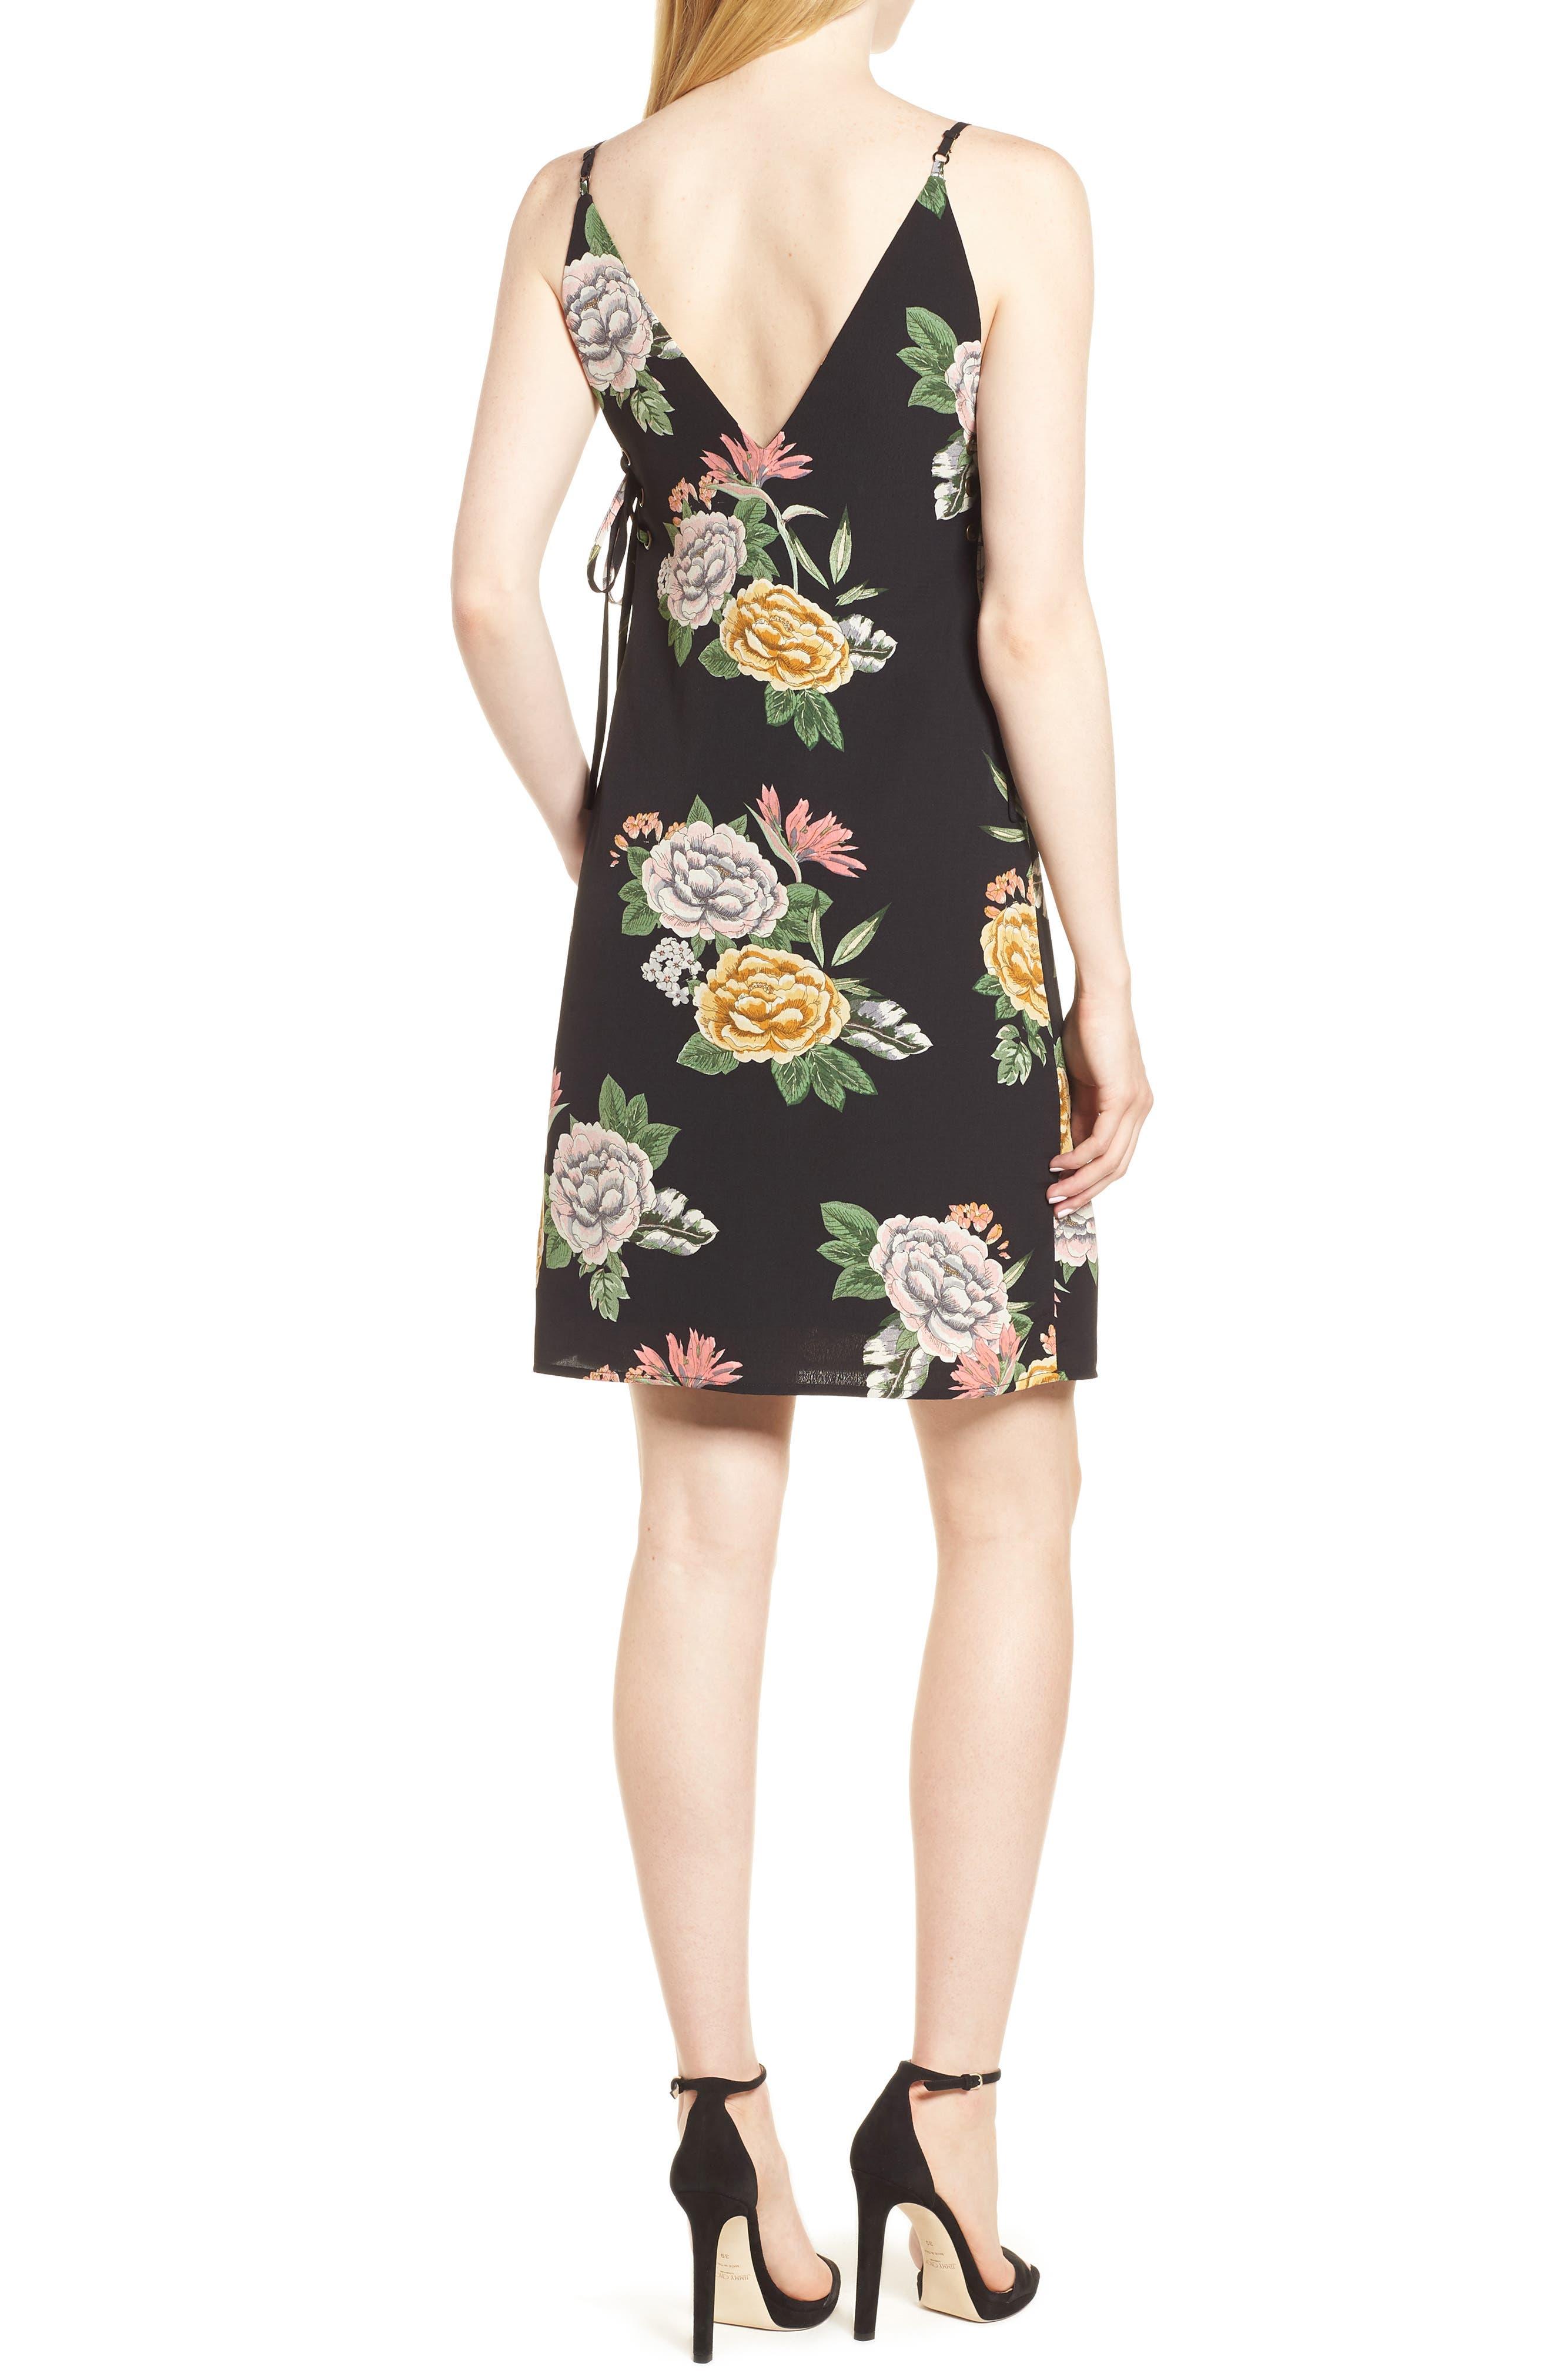 Enchanted Garden Lace-Up Dress,                             Alternate thumbnail 2, color,                             ENCHANTED GARDEN PRINT